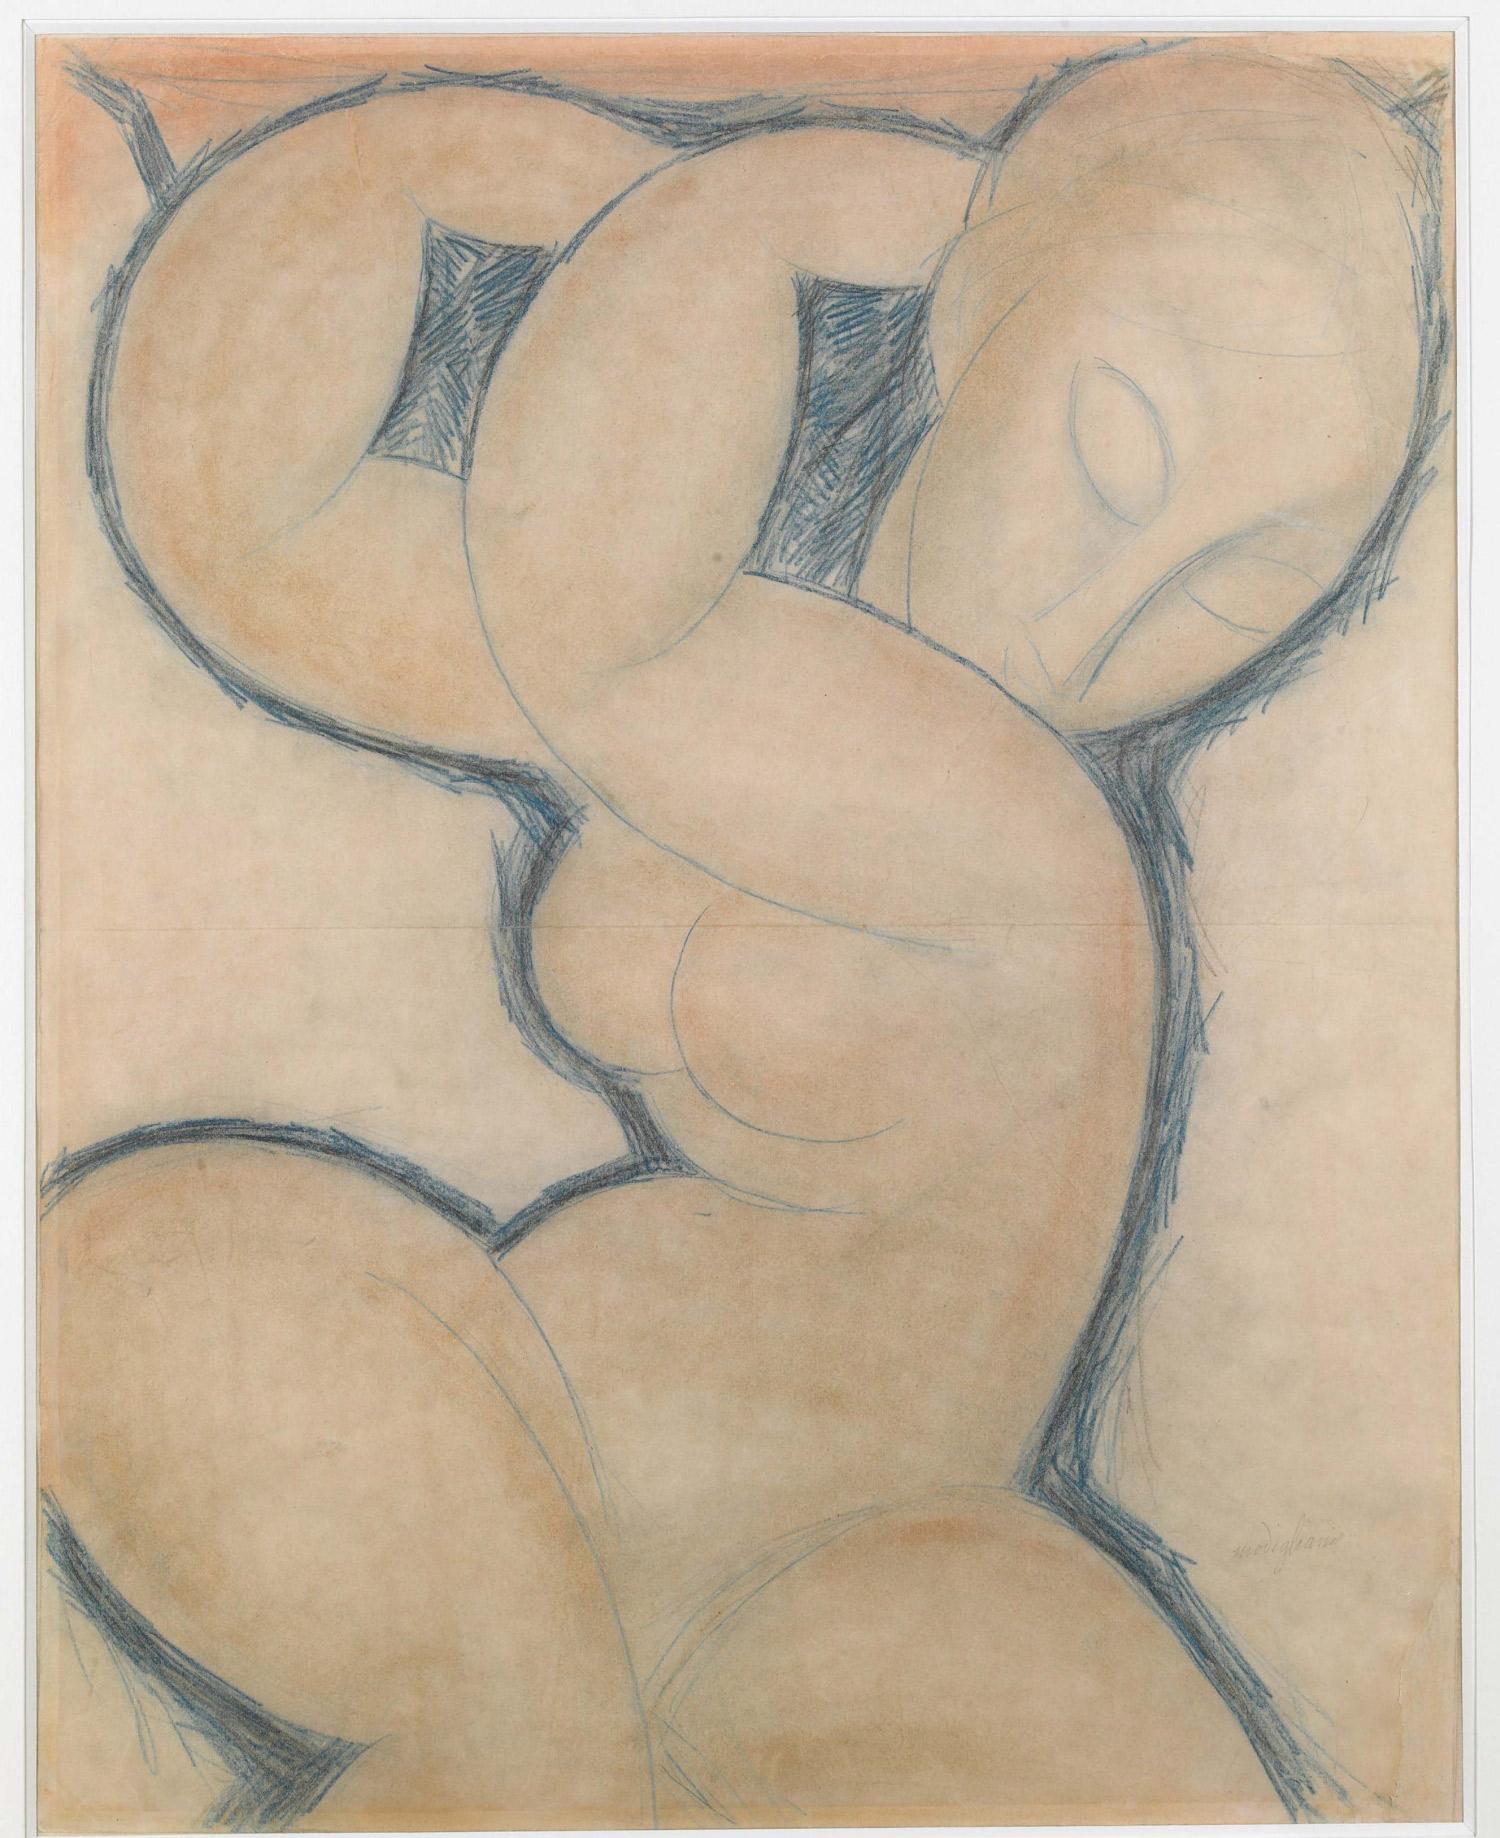 Amedeo Modigliani, Cariatide (bleue) (1913 circa; matita blu su carta, 56,5 x 45 cm; Collezione Jonas Netter)